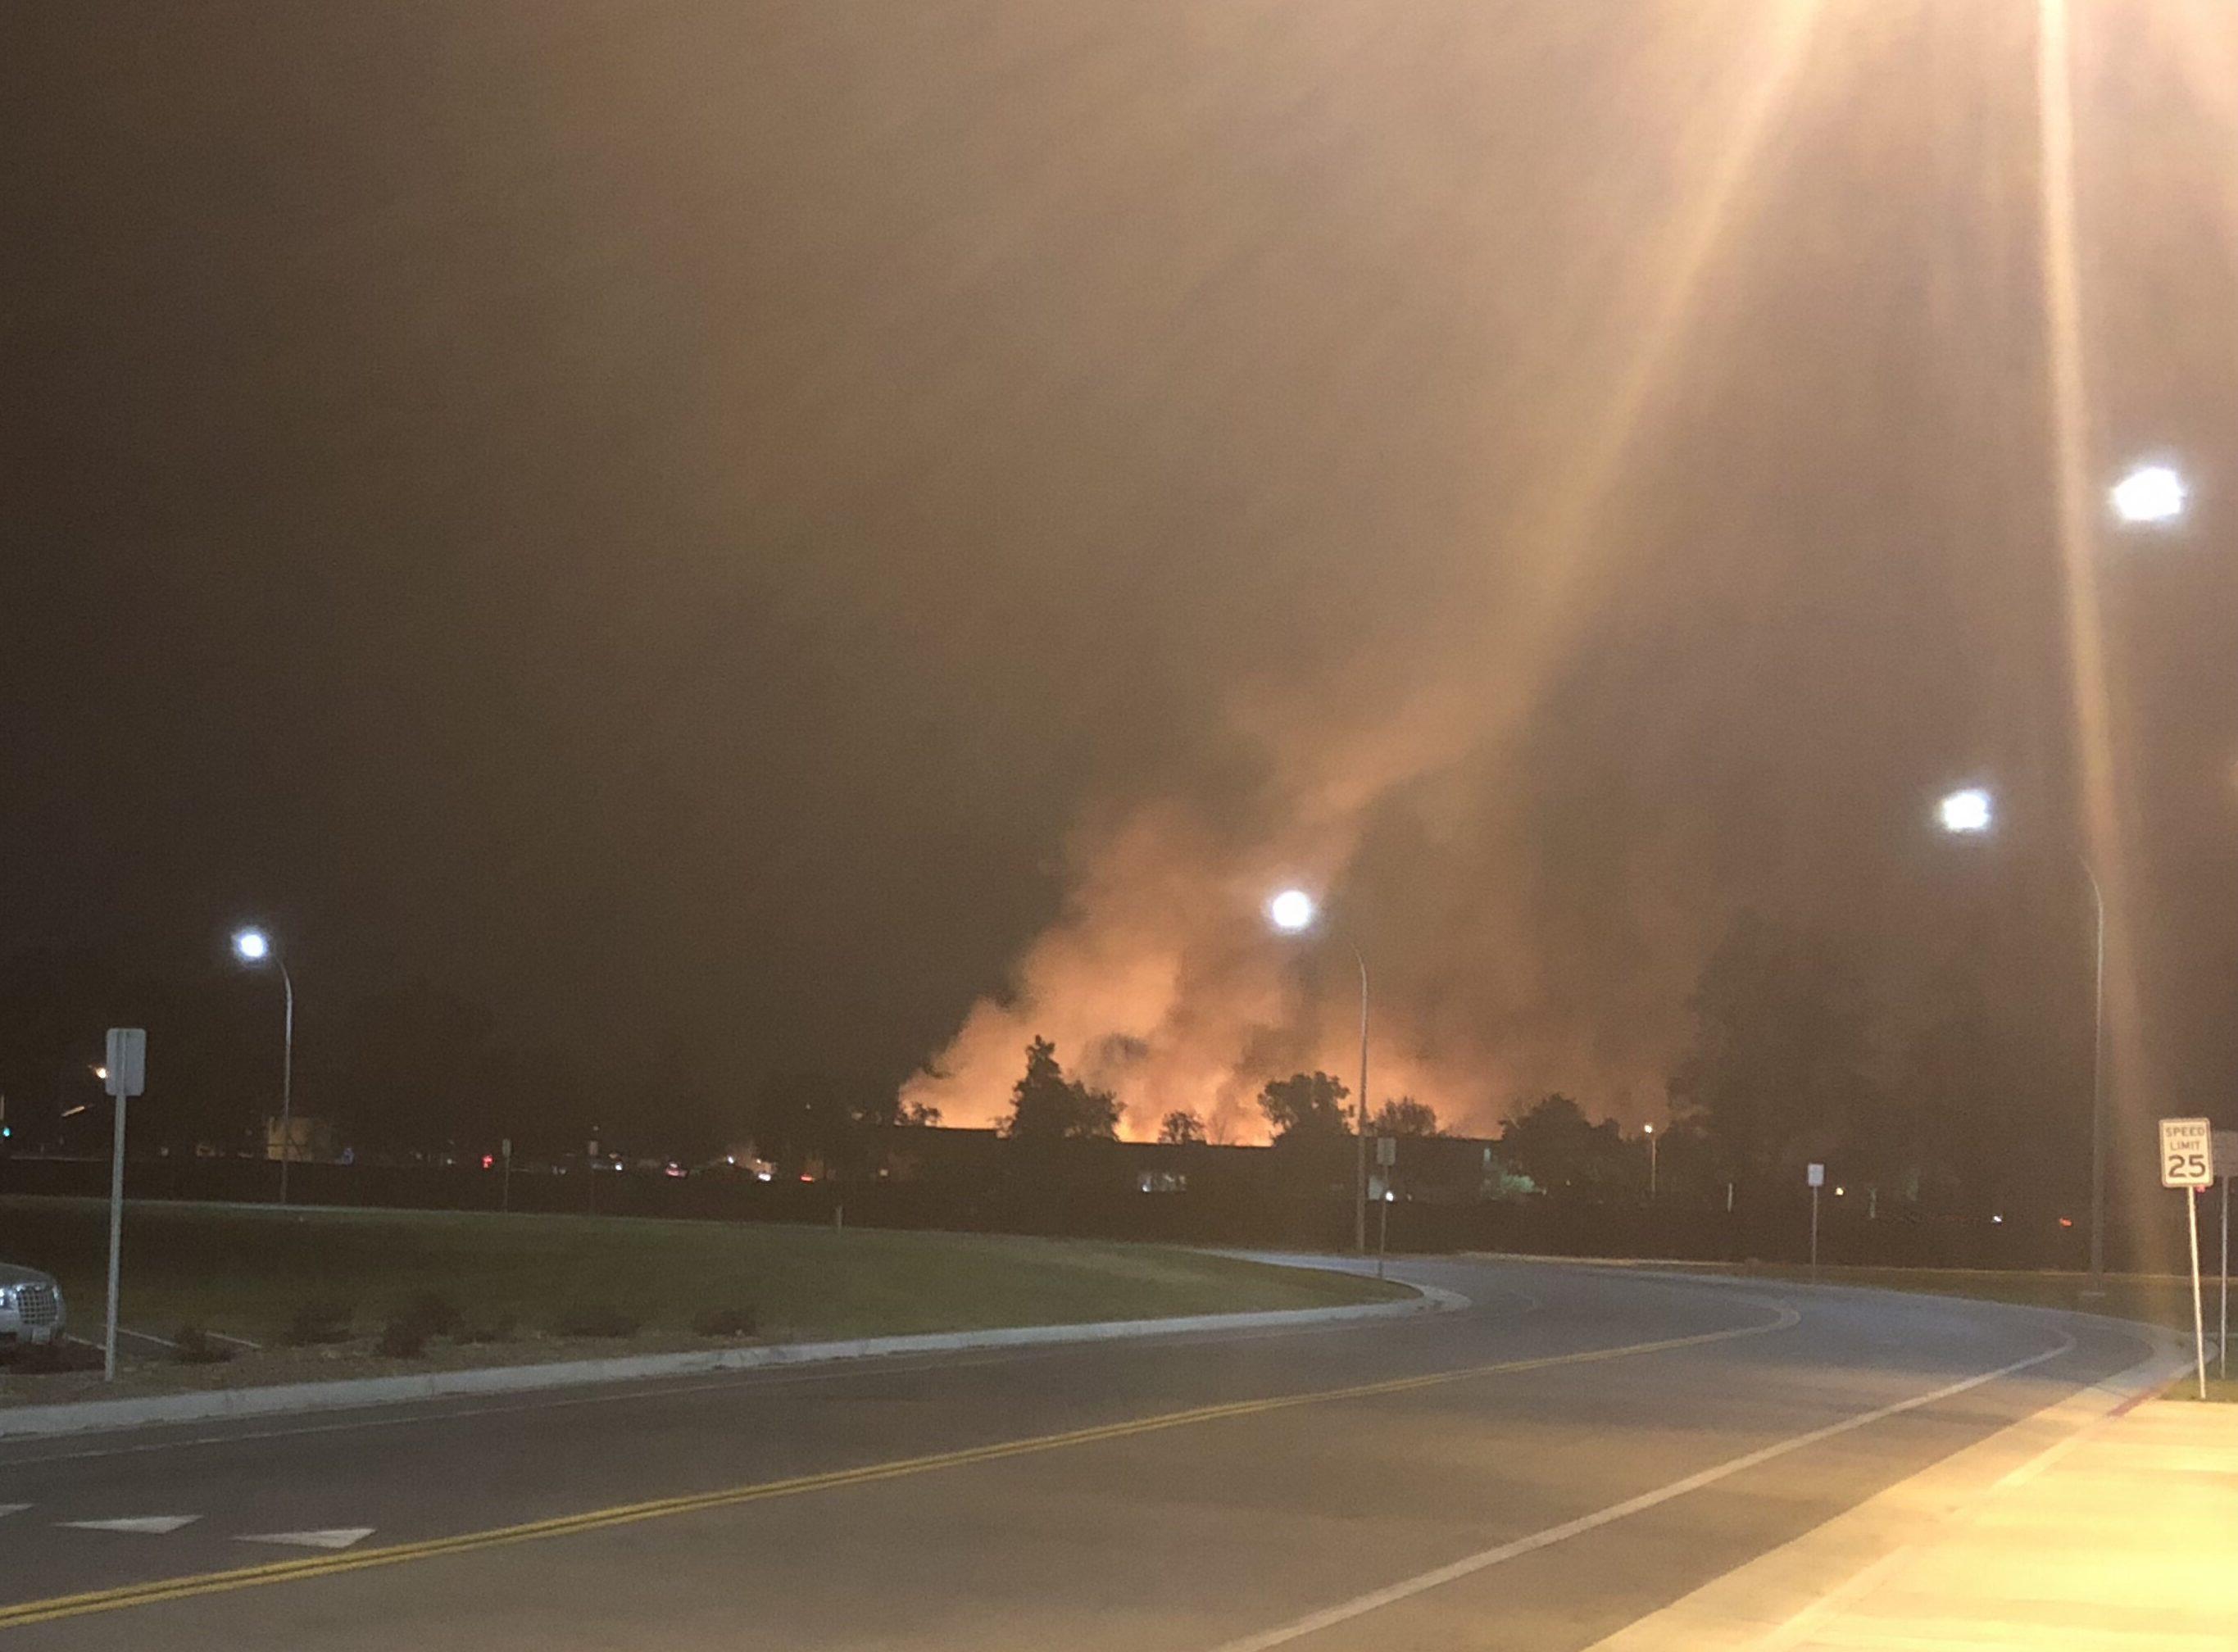 Roaring fire near campus under investigation